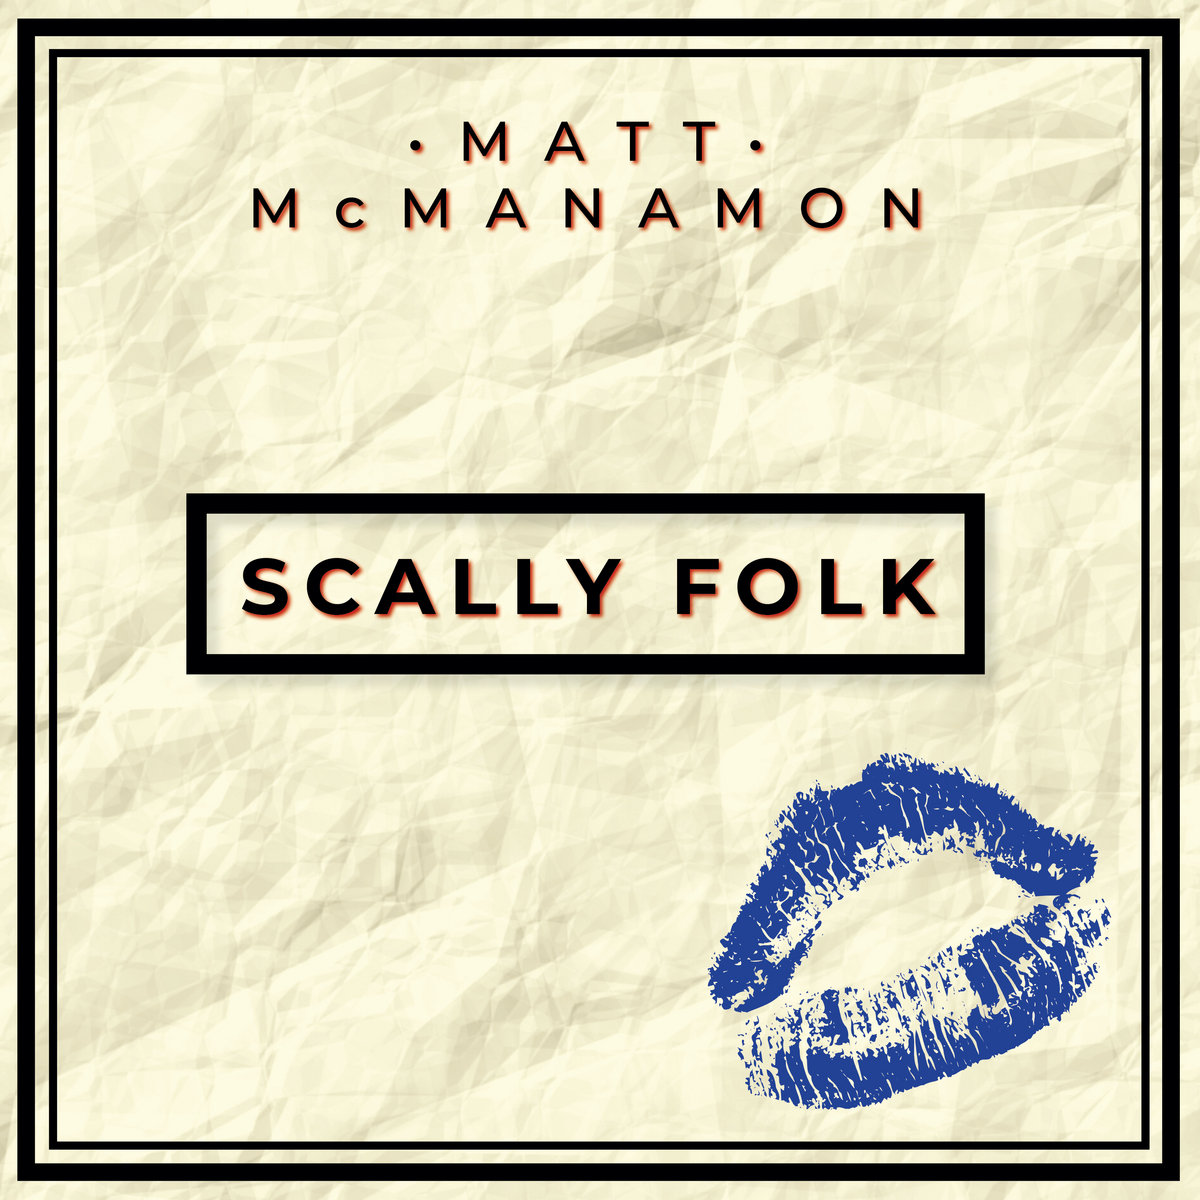 News – Matt McManamon – Scally Folk